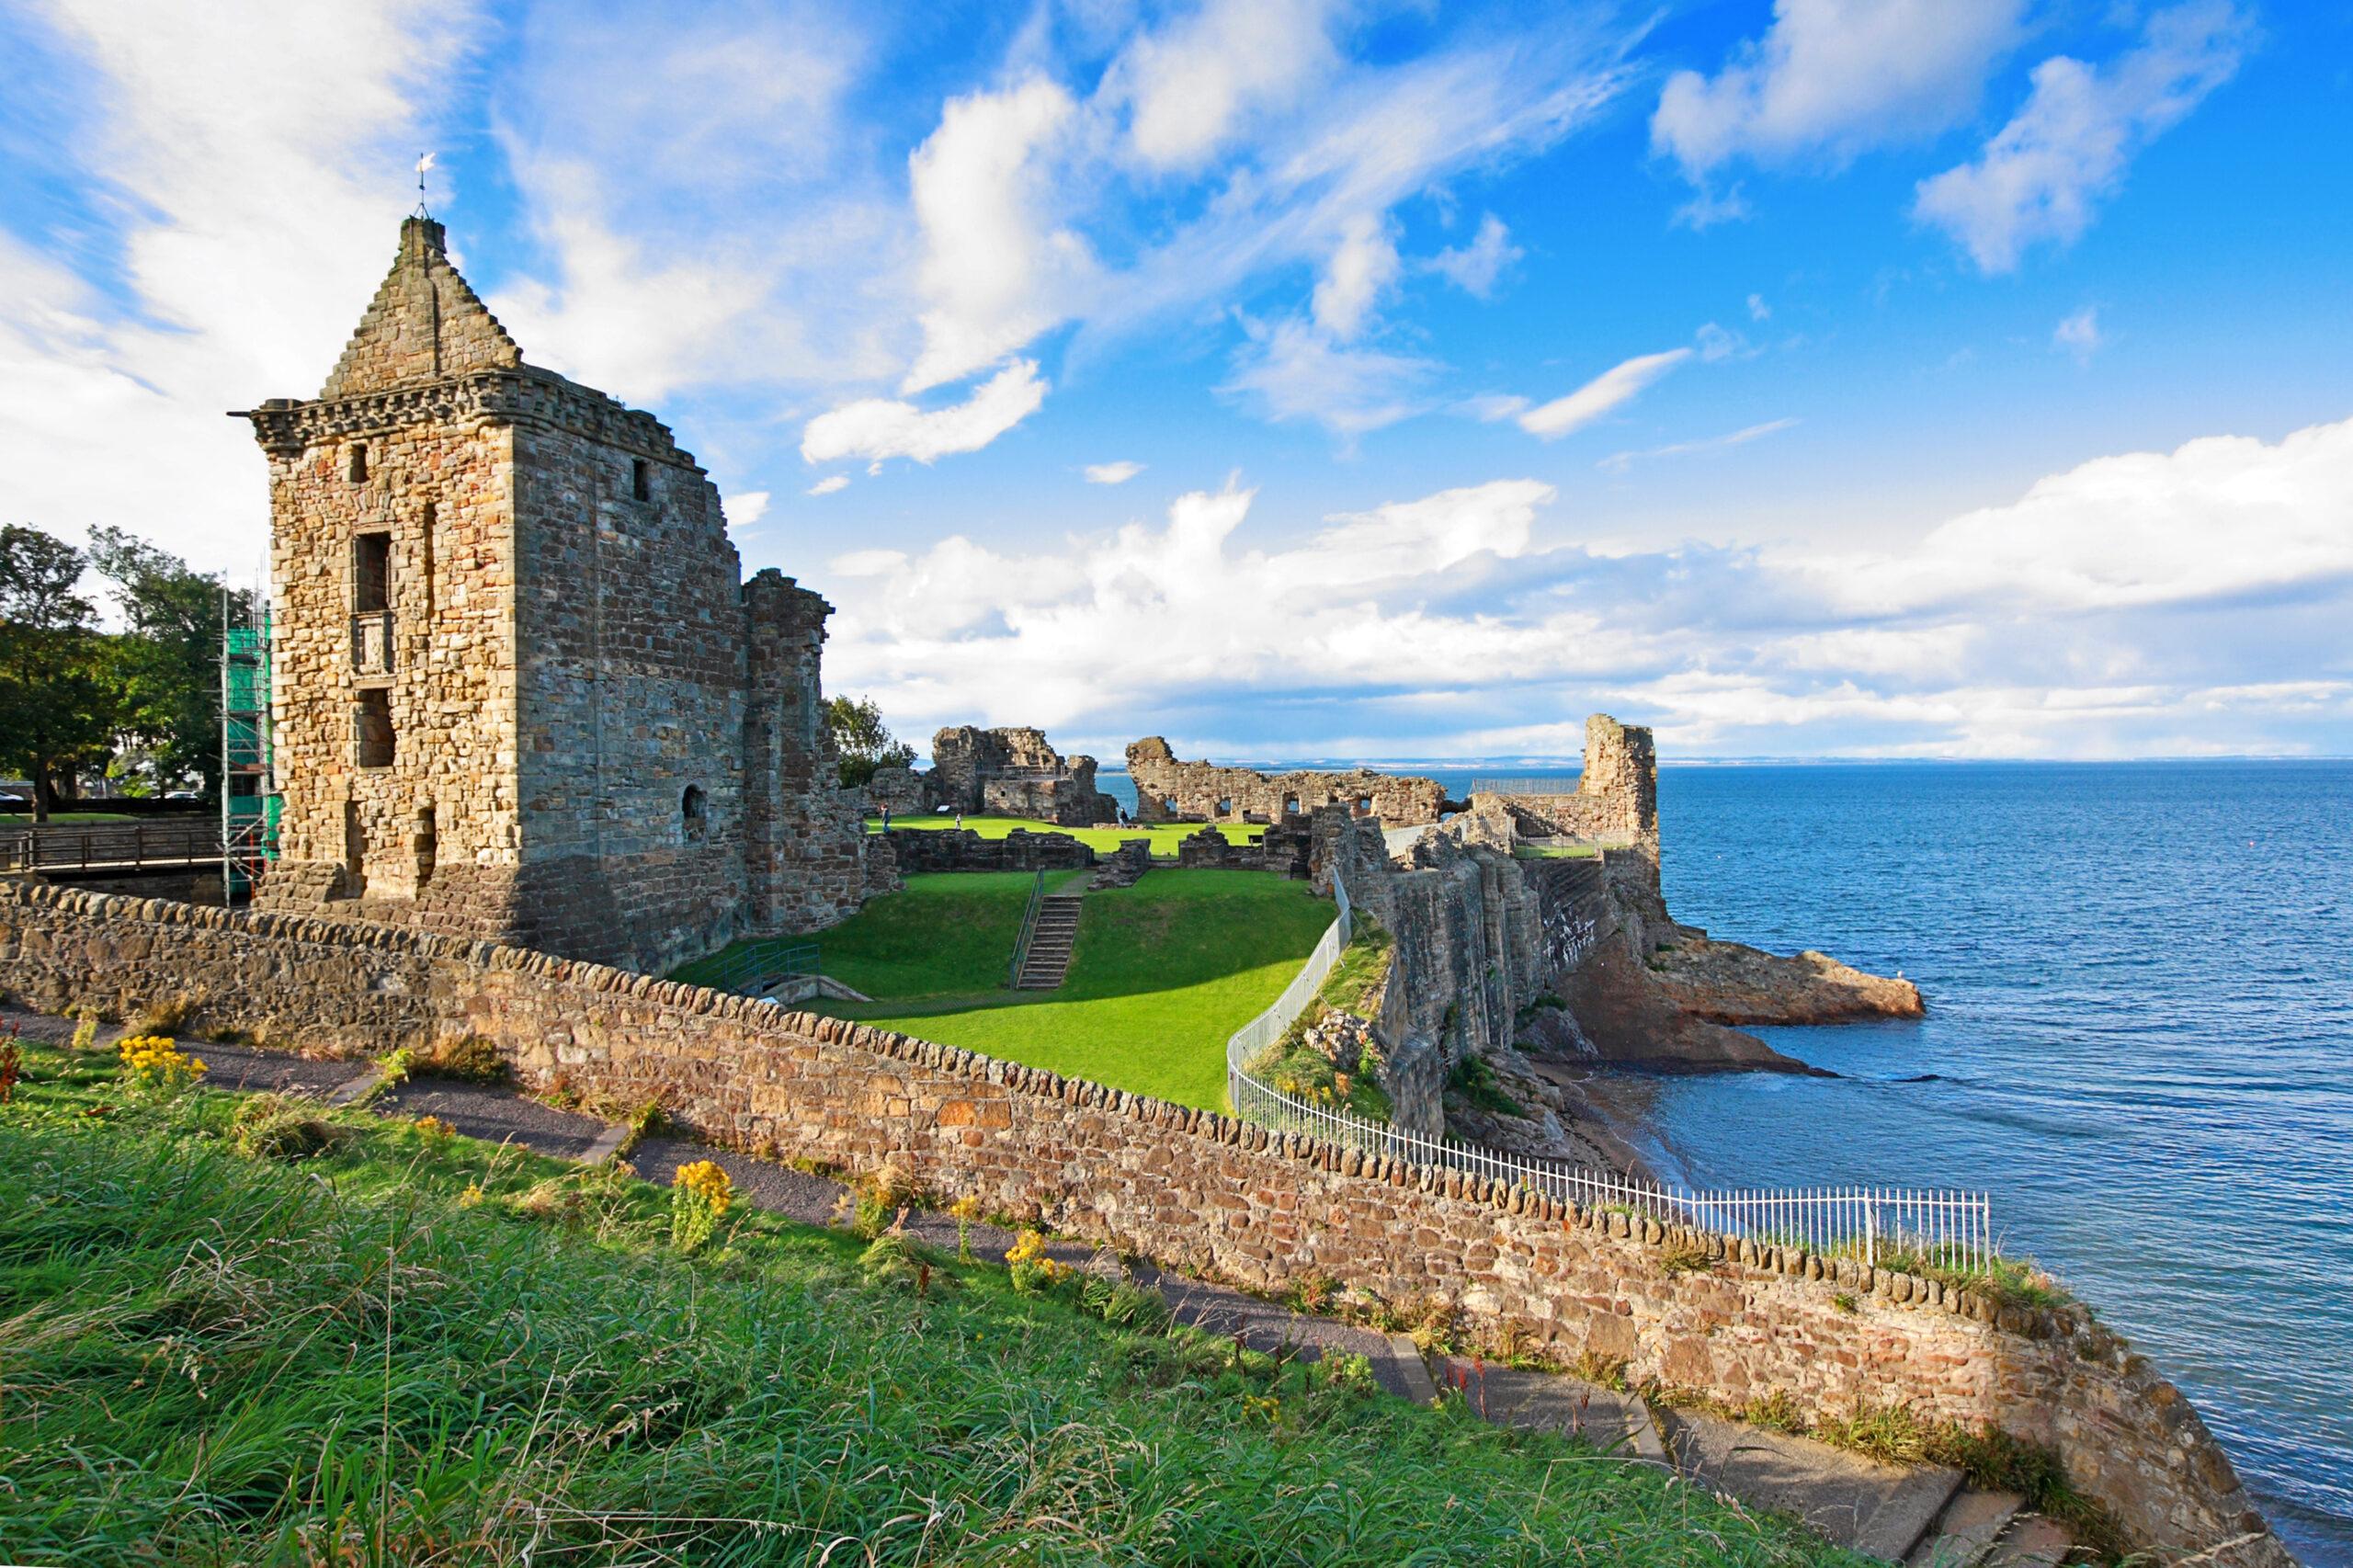 Ruins of St Andrews Castle, Fife, Scotland, United Kingdom